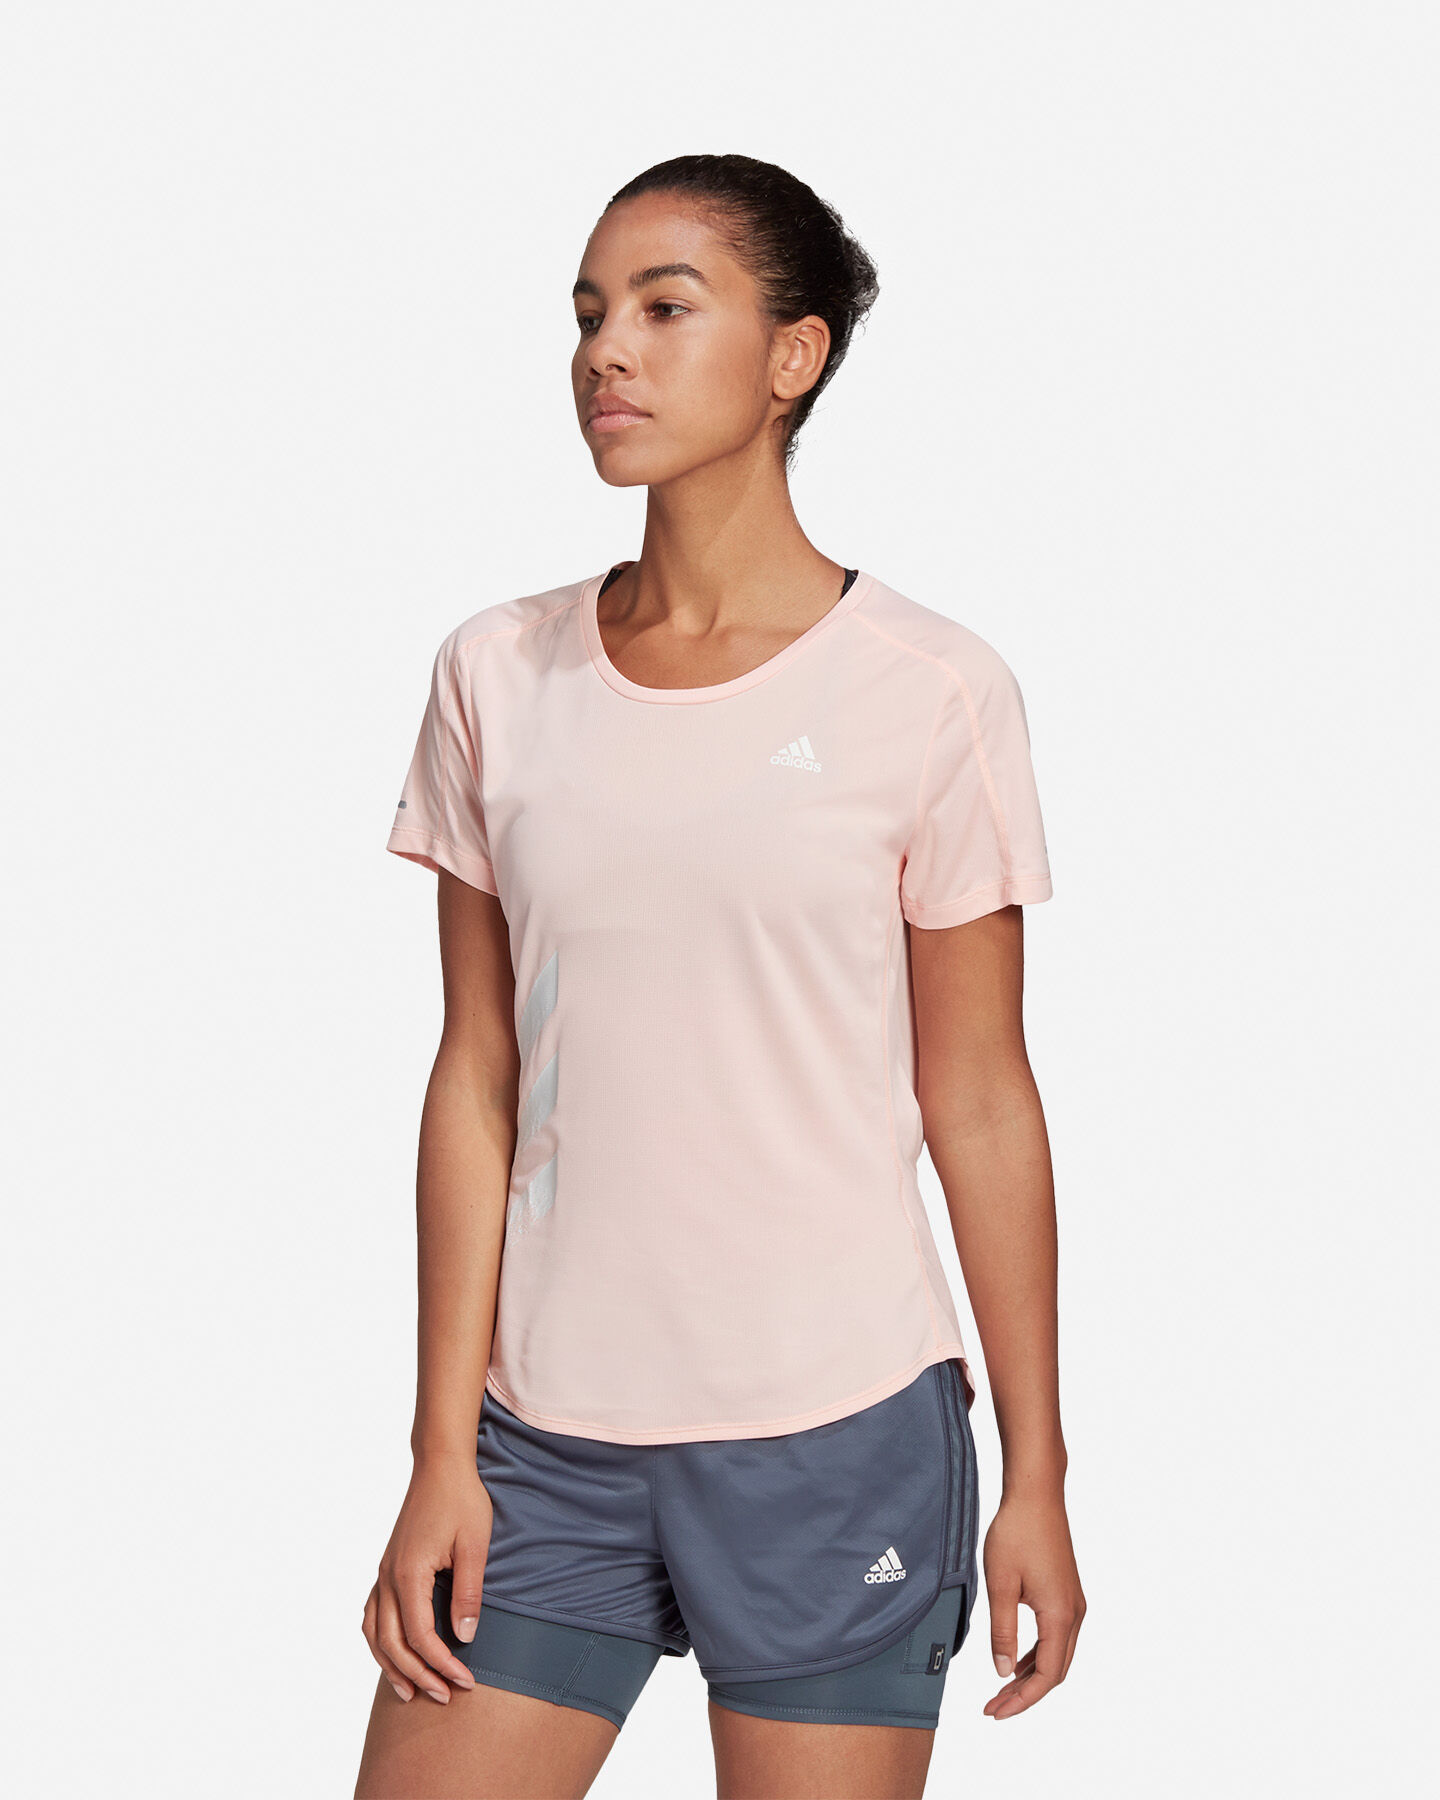 T-Shirt running ADIDAS RUN IT 3 STRIPES W S5210001 scatto 2